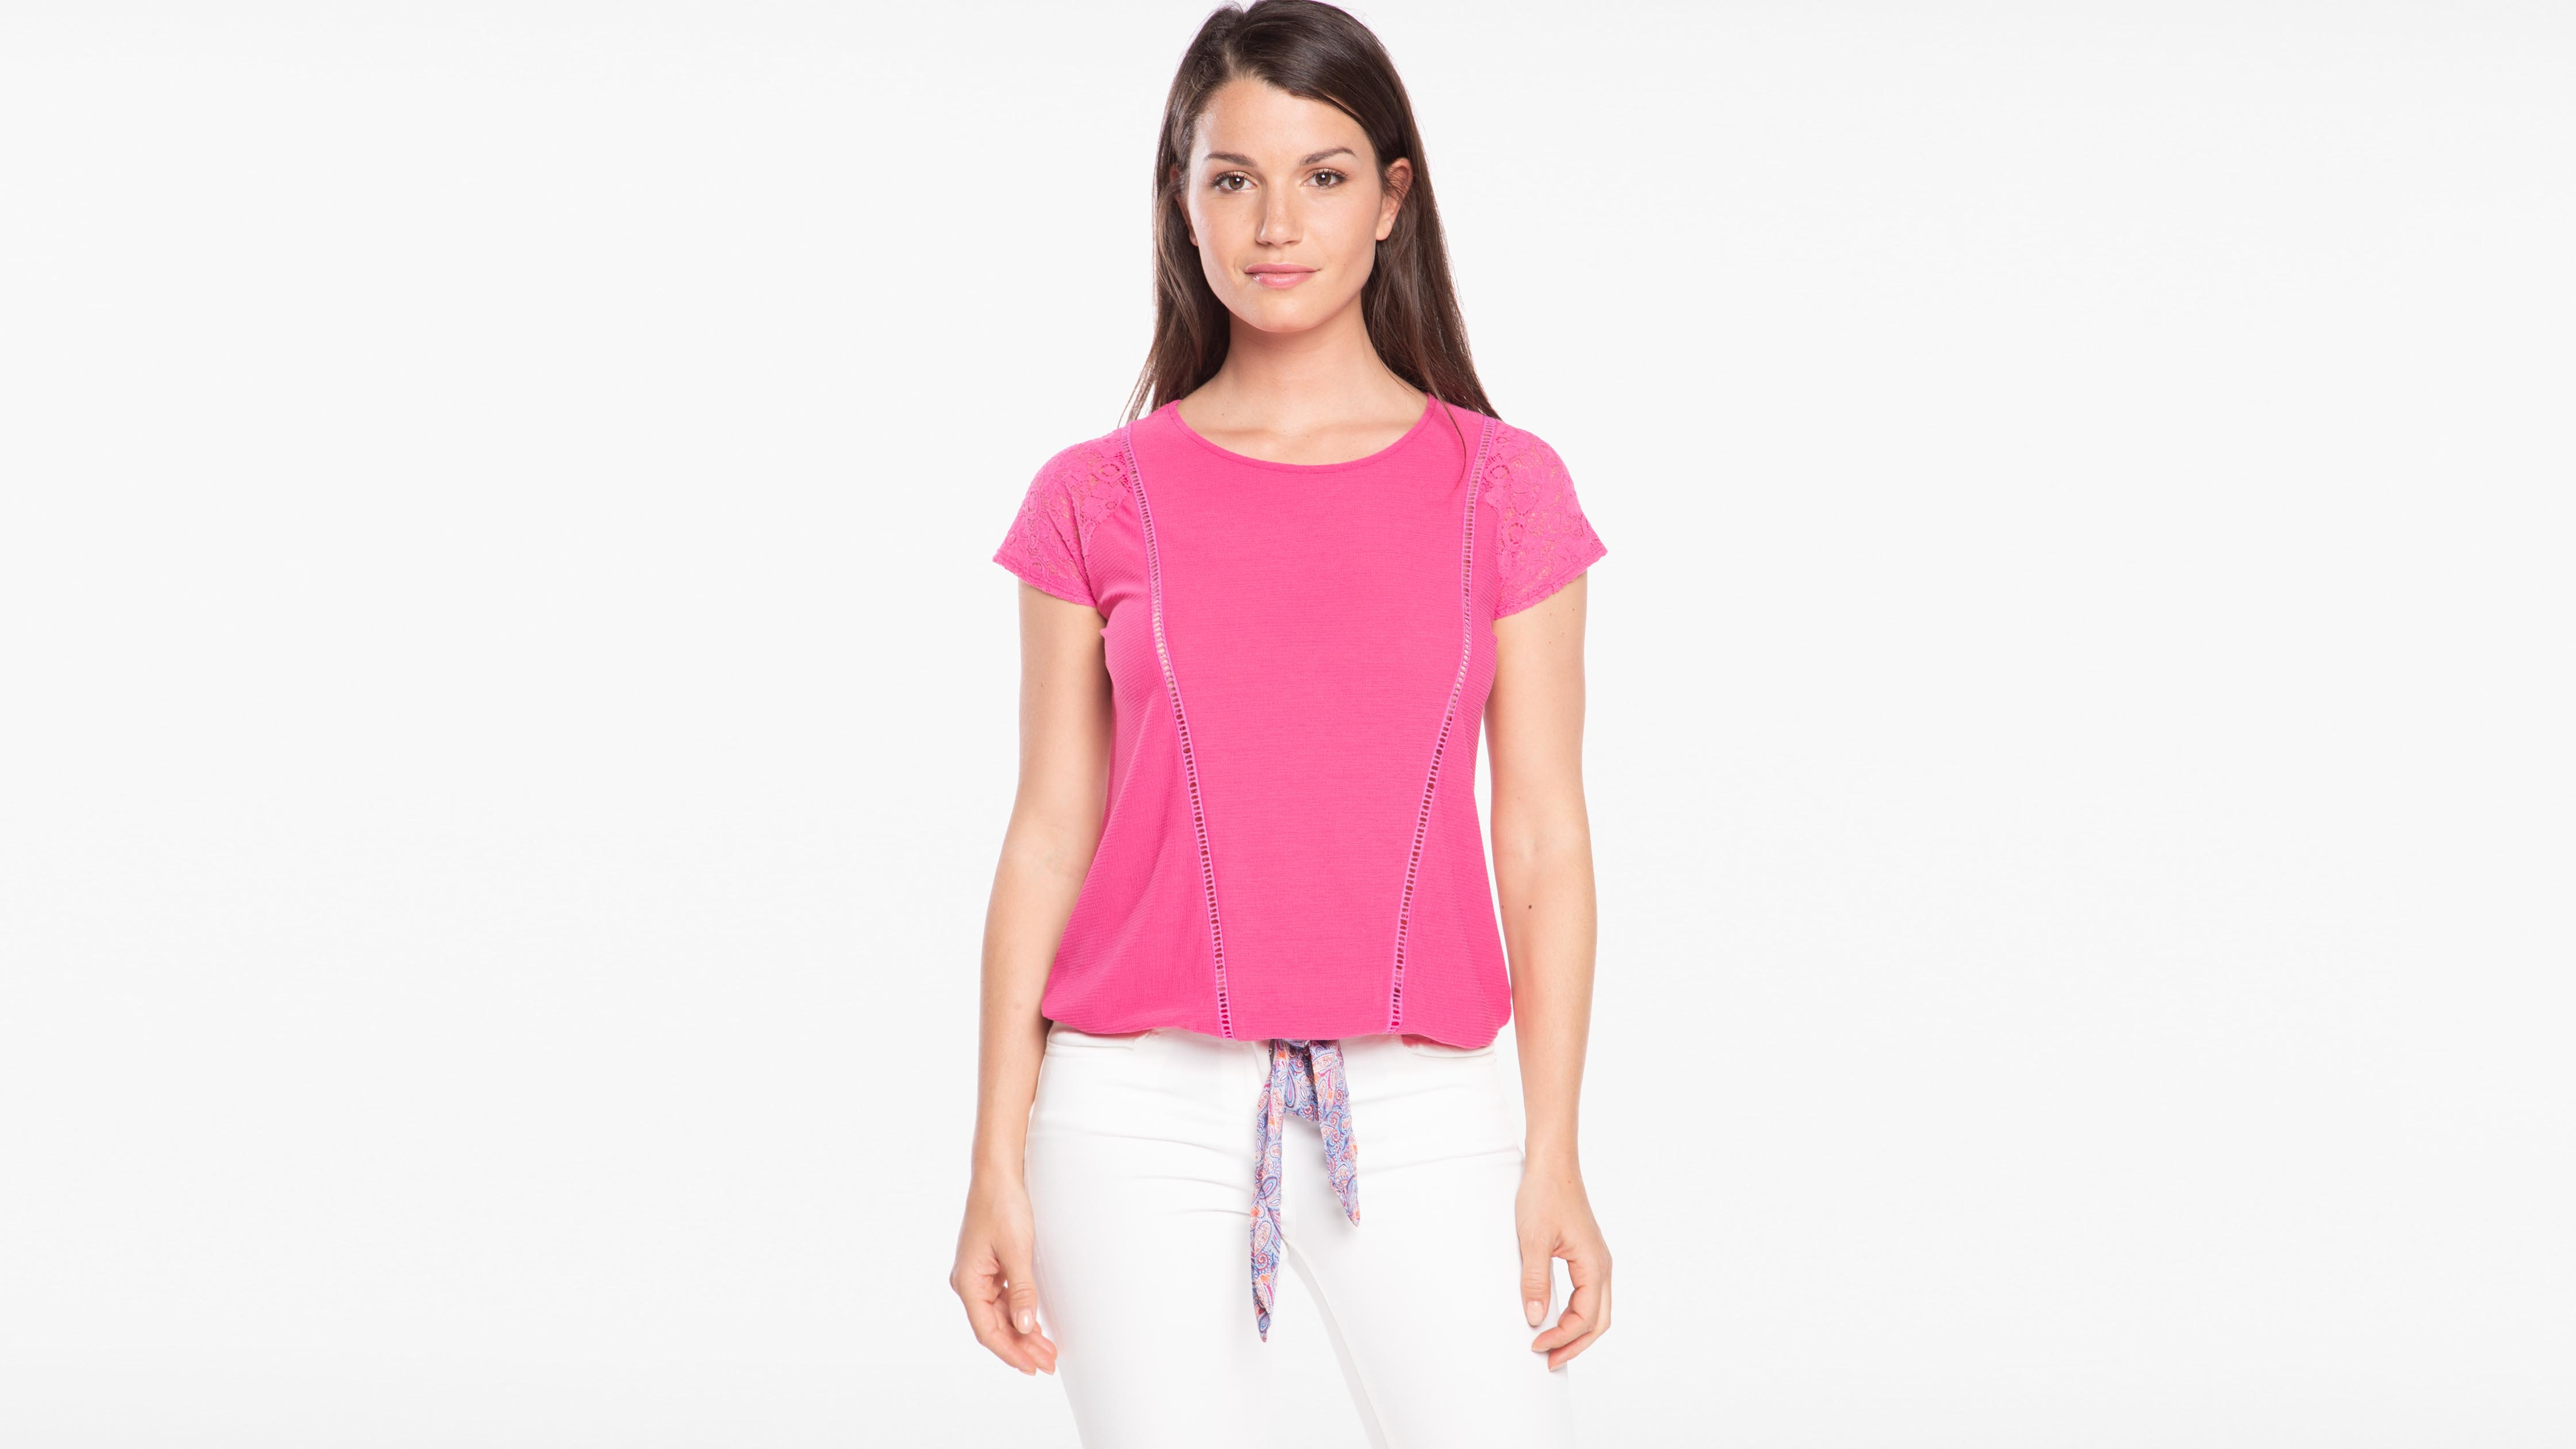 754e6a94012 T-shirt col rond manches en dentelle rose fushia femme femme